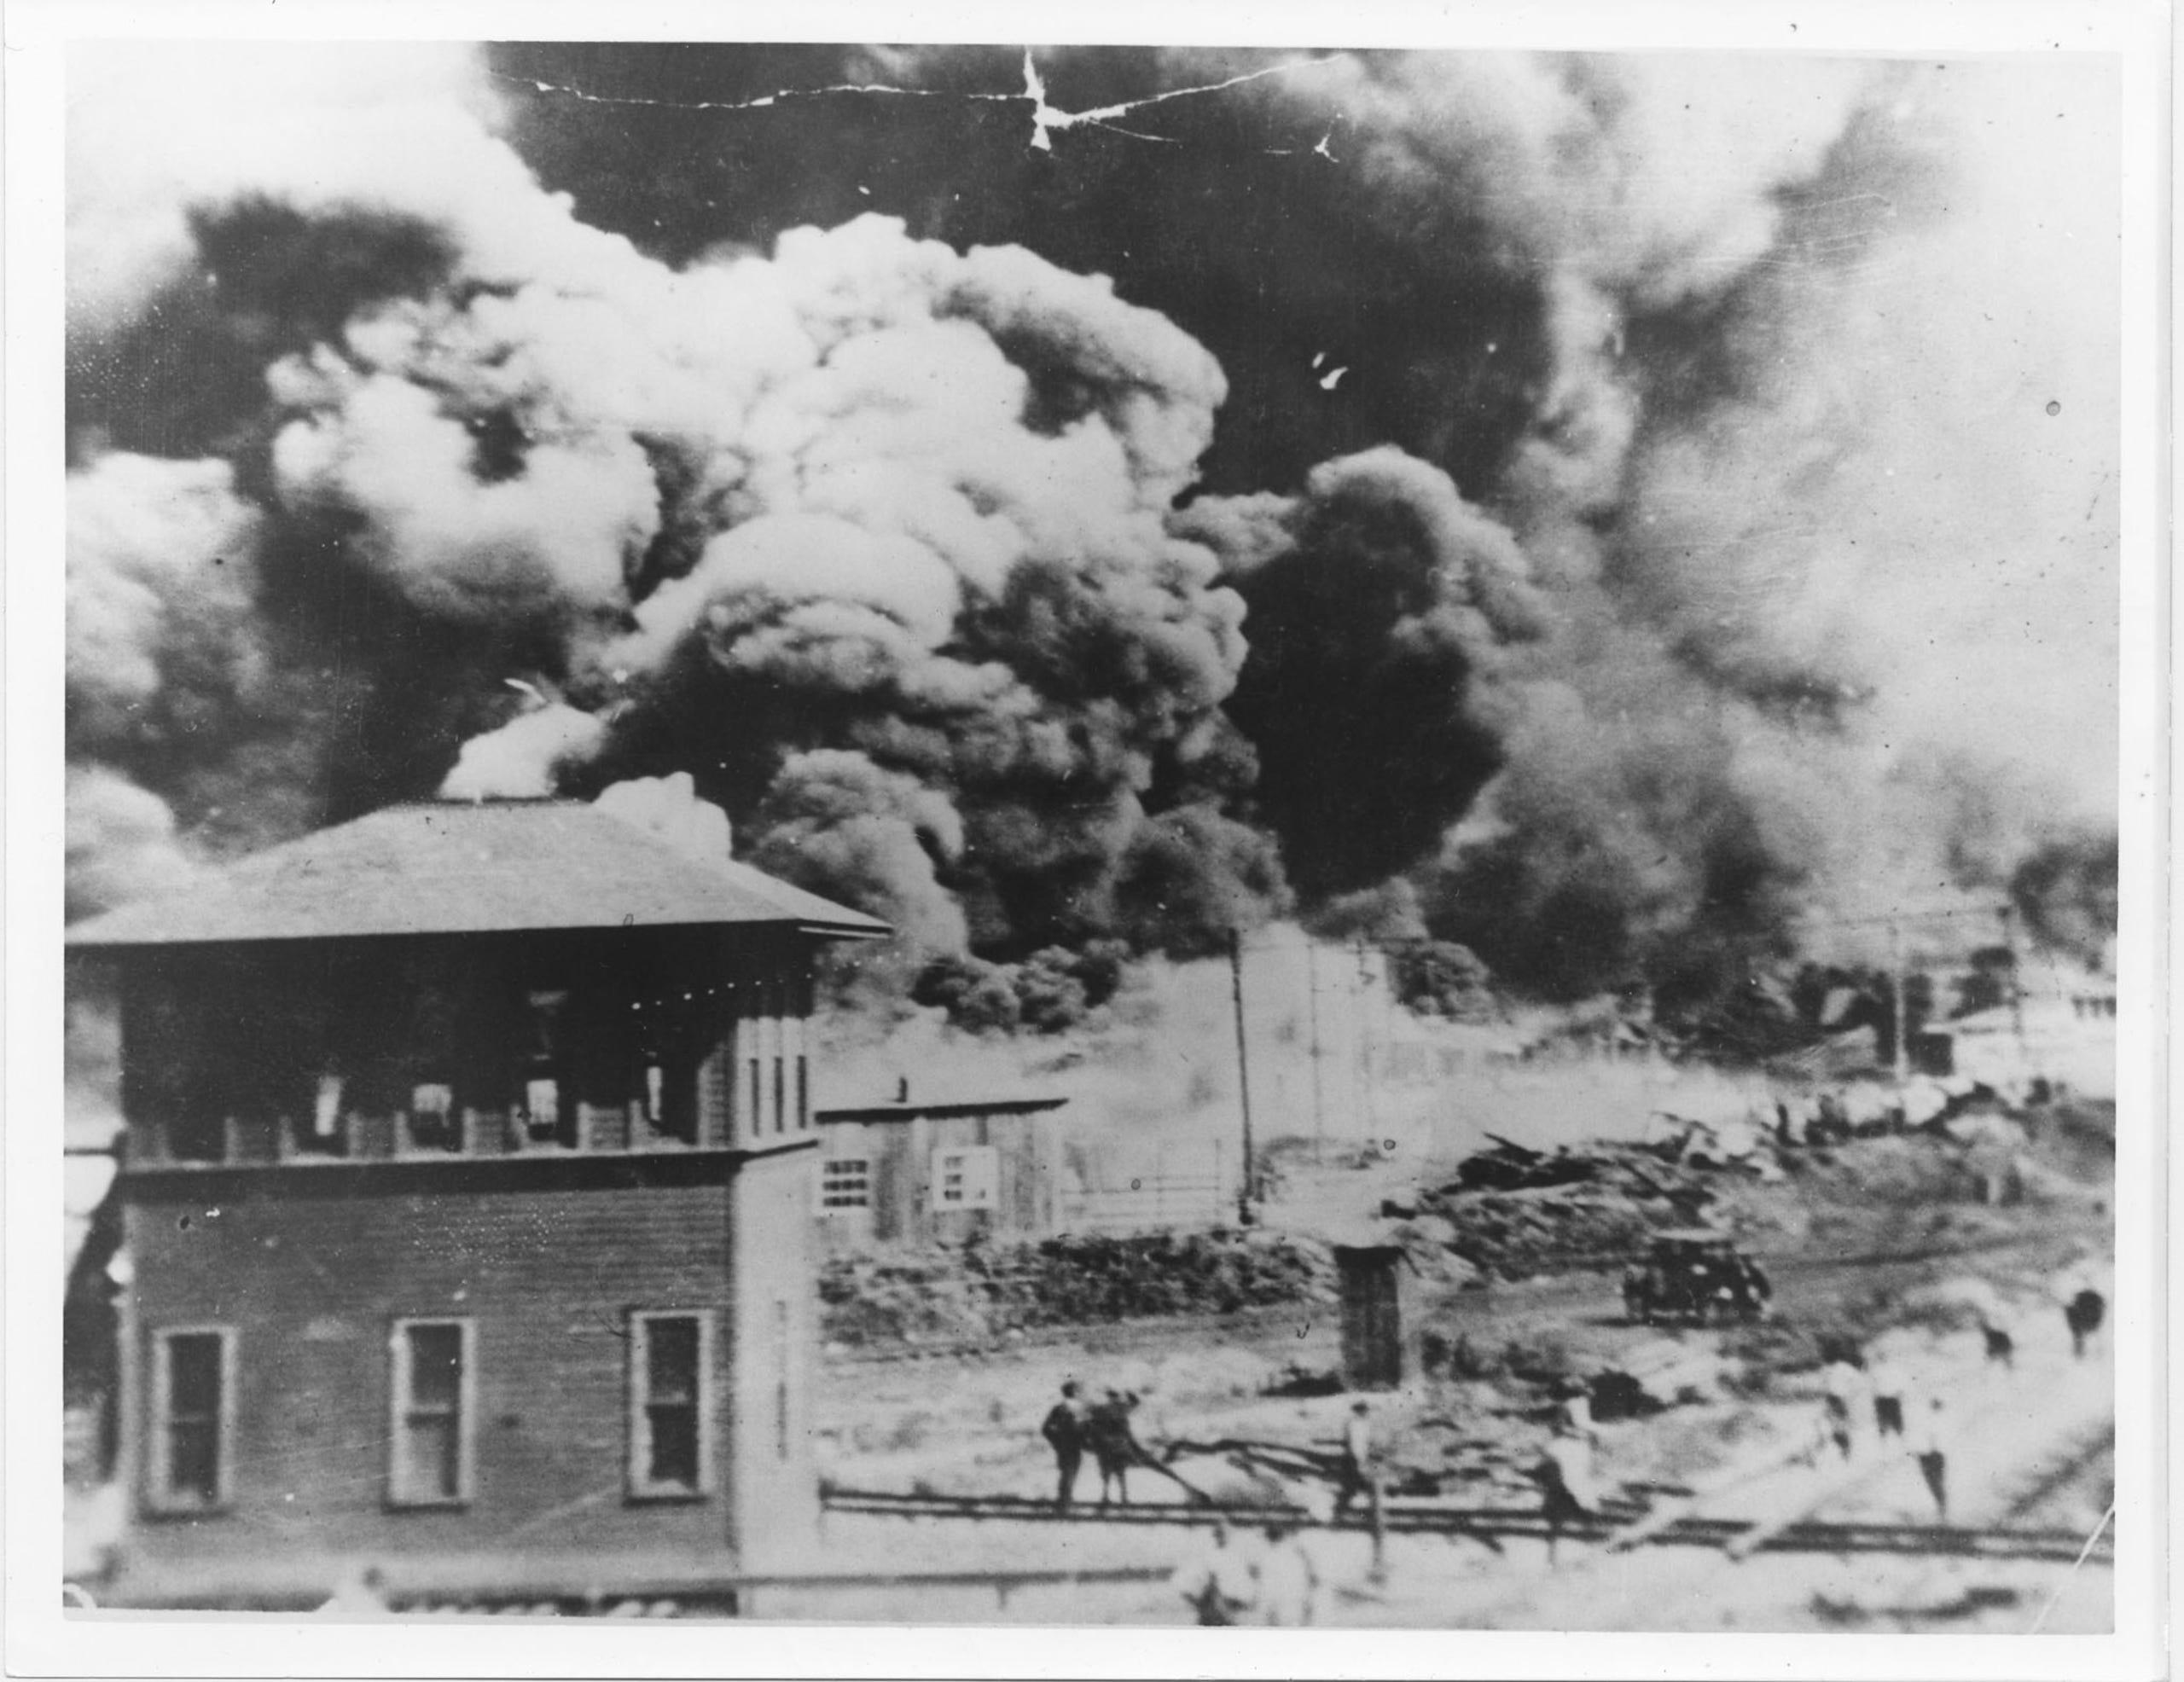 1921 Tulsa Race Massacre destroyed 'Black Wall Street' community